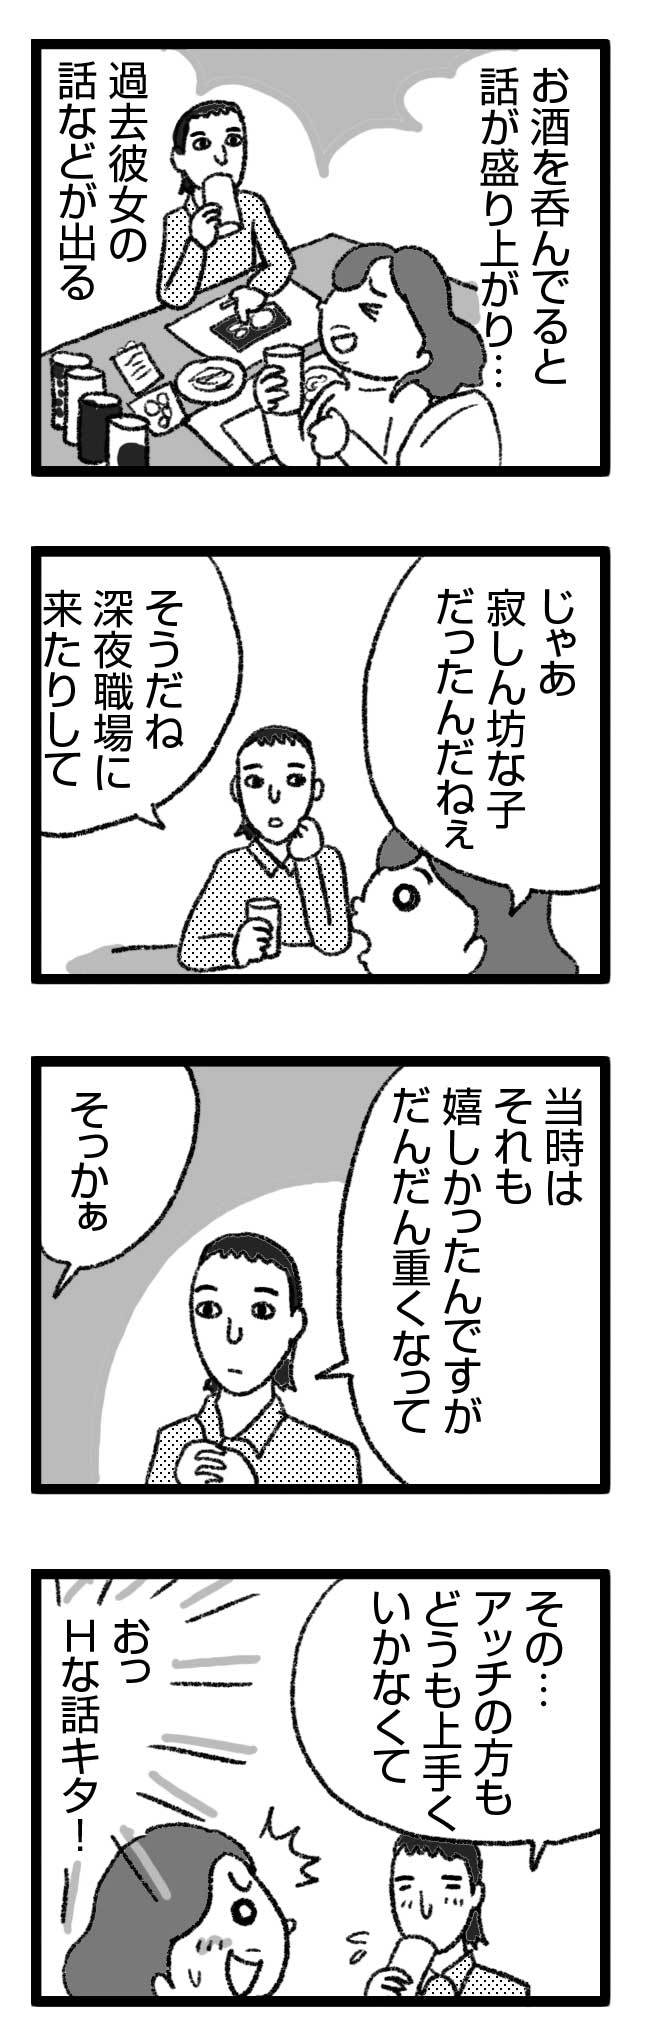 Hのトラウマ1 エッチ 昔 元 トラウマ 性生活 レス まんが 漫画 マンガ